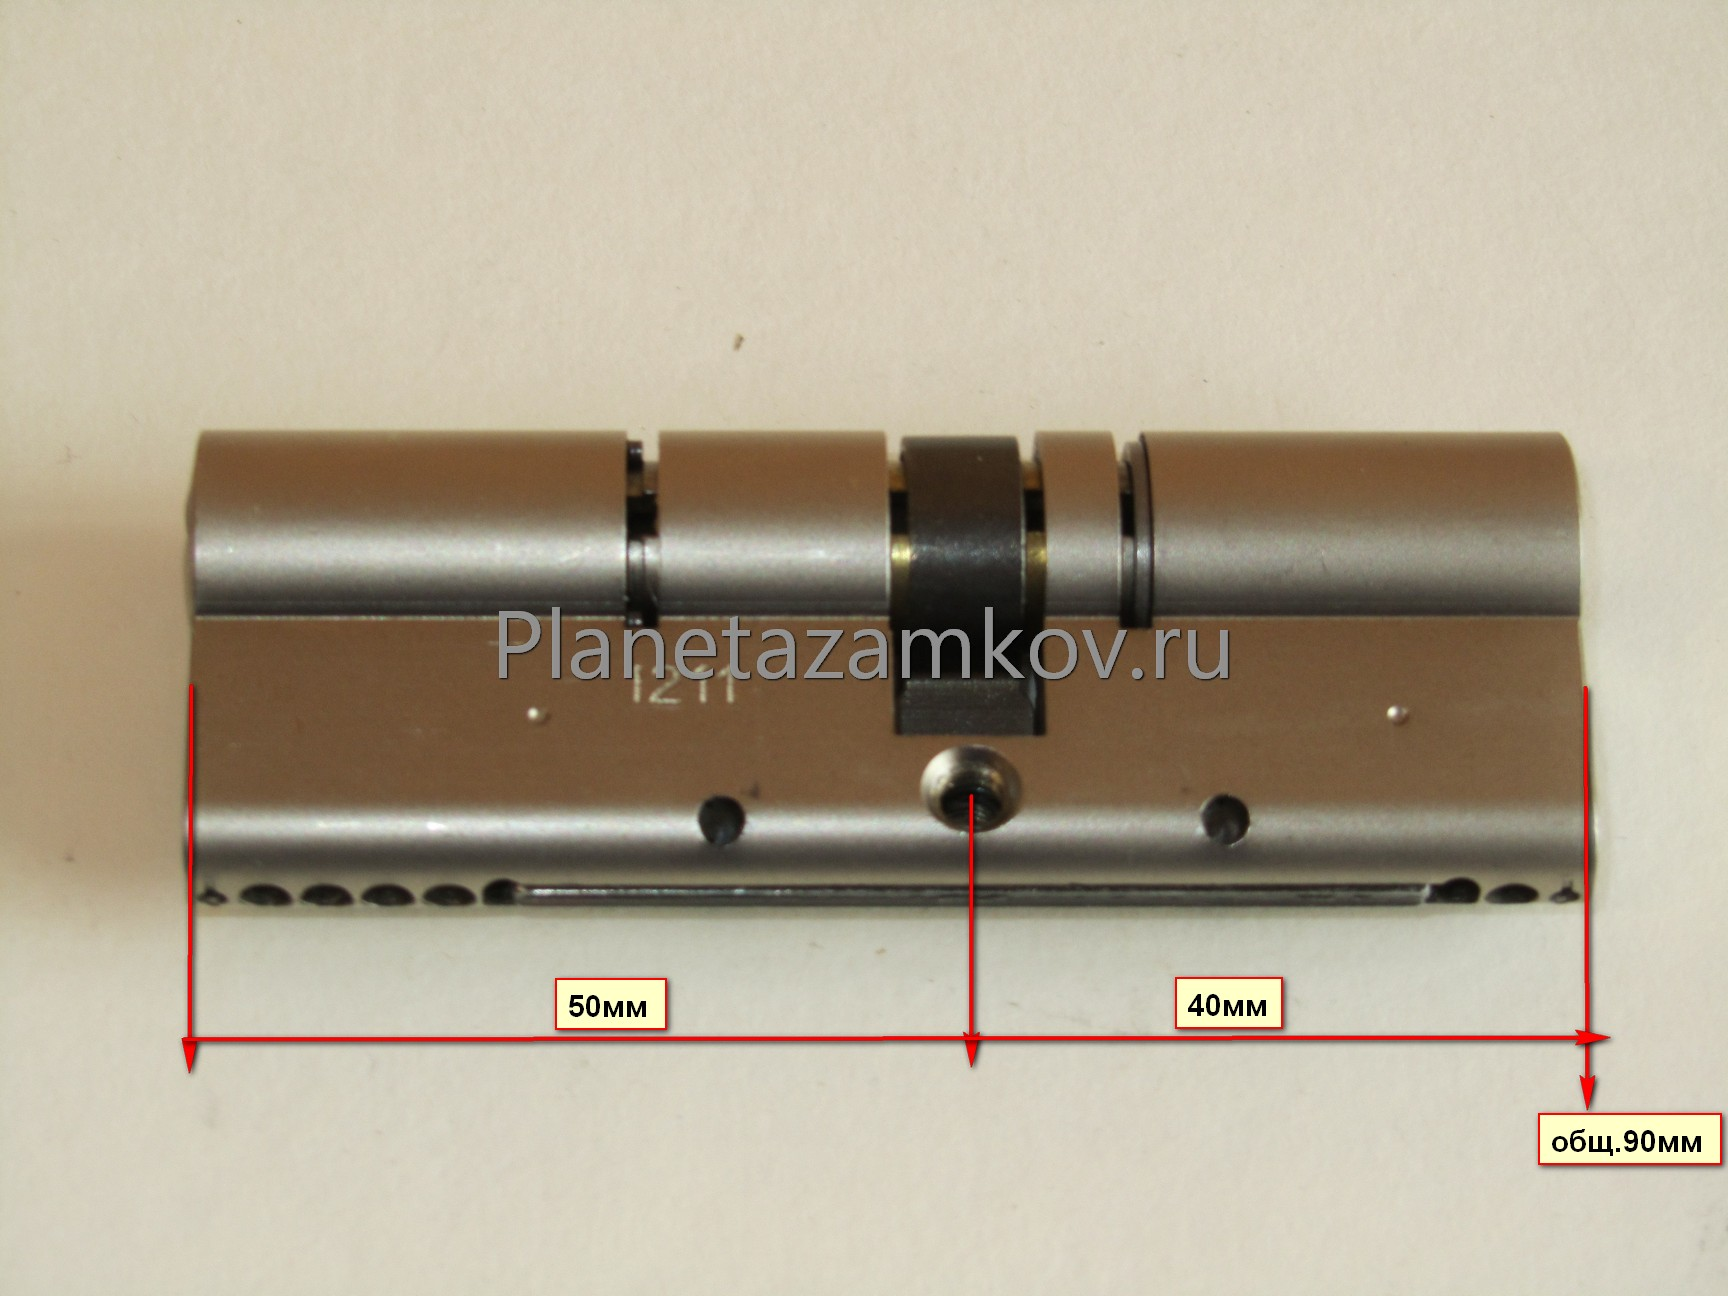 личинка Mul-t-lock (Мультилок) 90мм